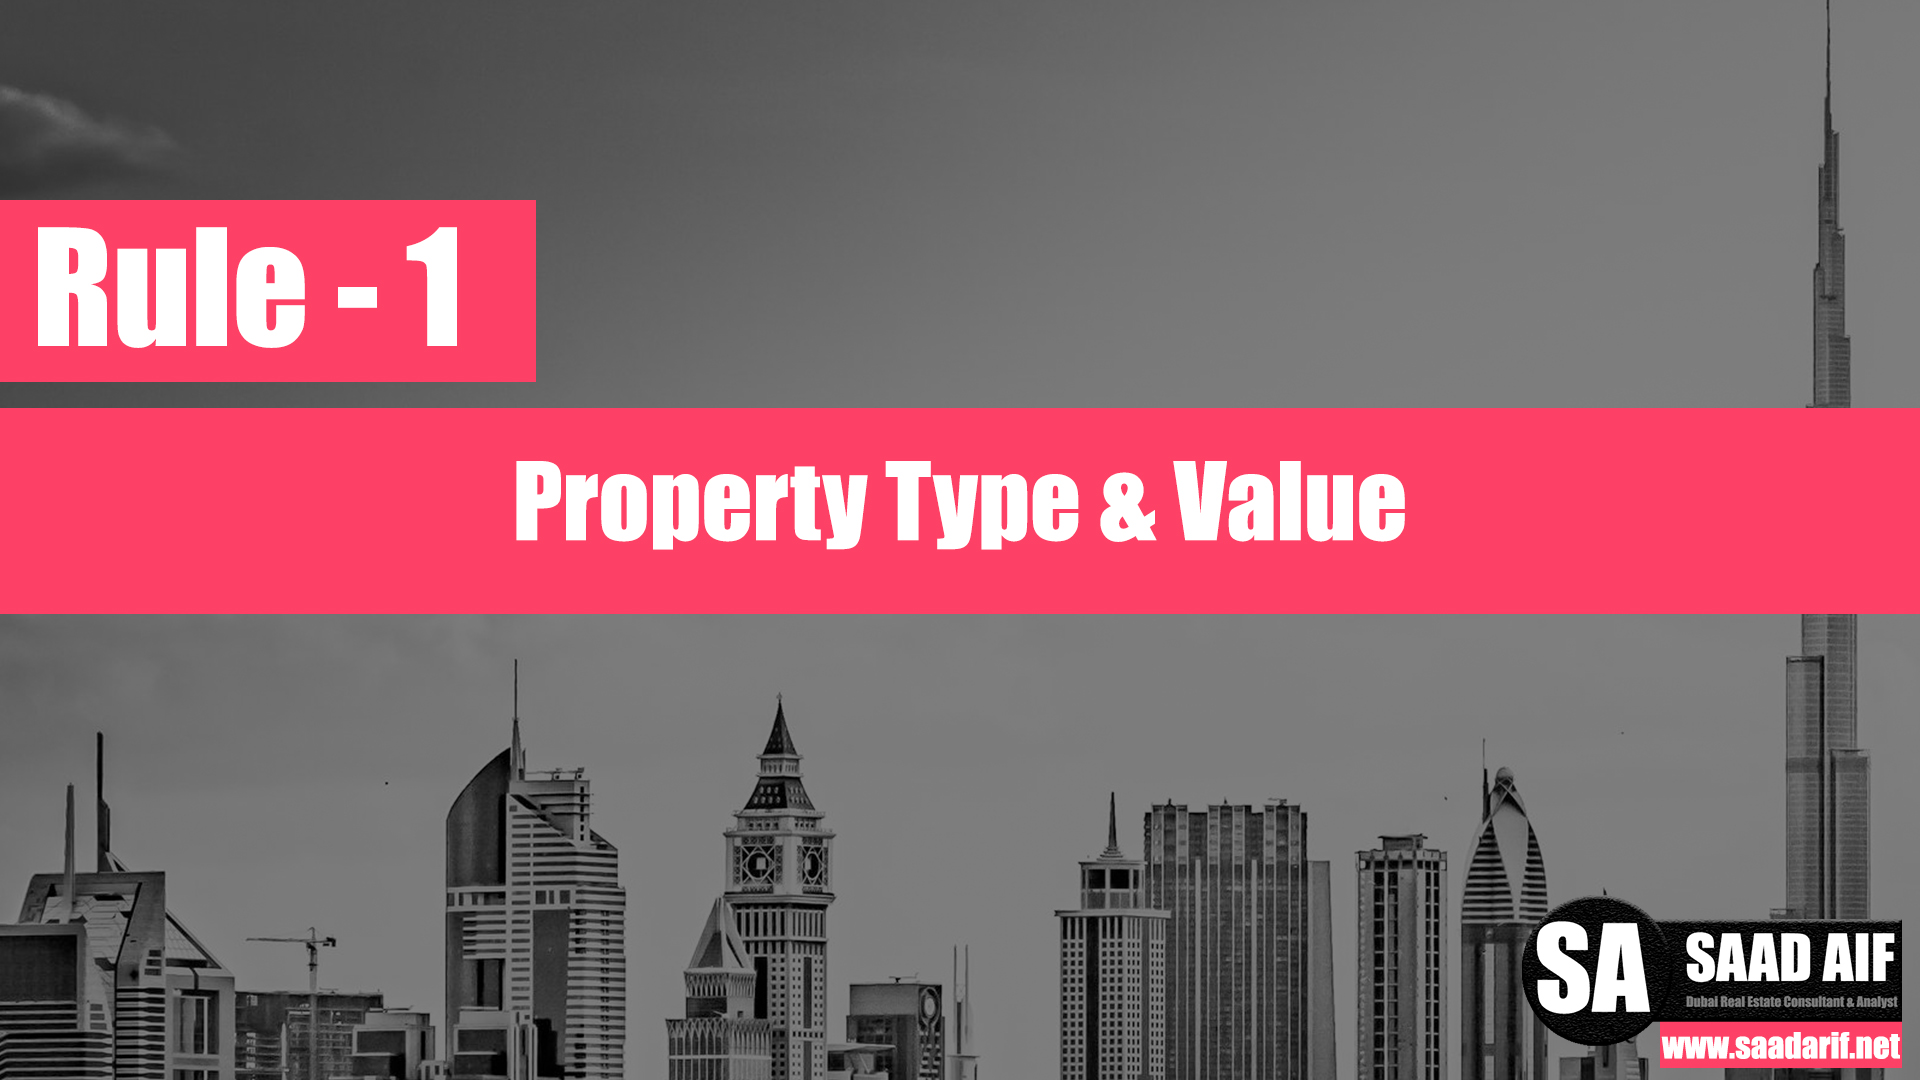 Dubai Property Visa Rules - How to Obtain UAE Investor Visa